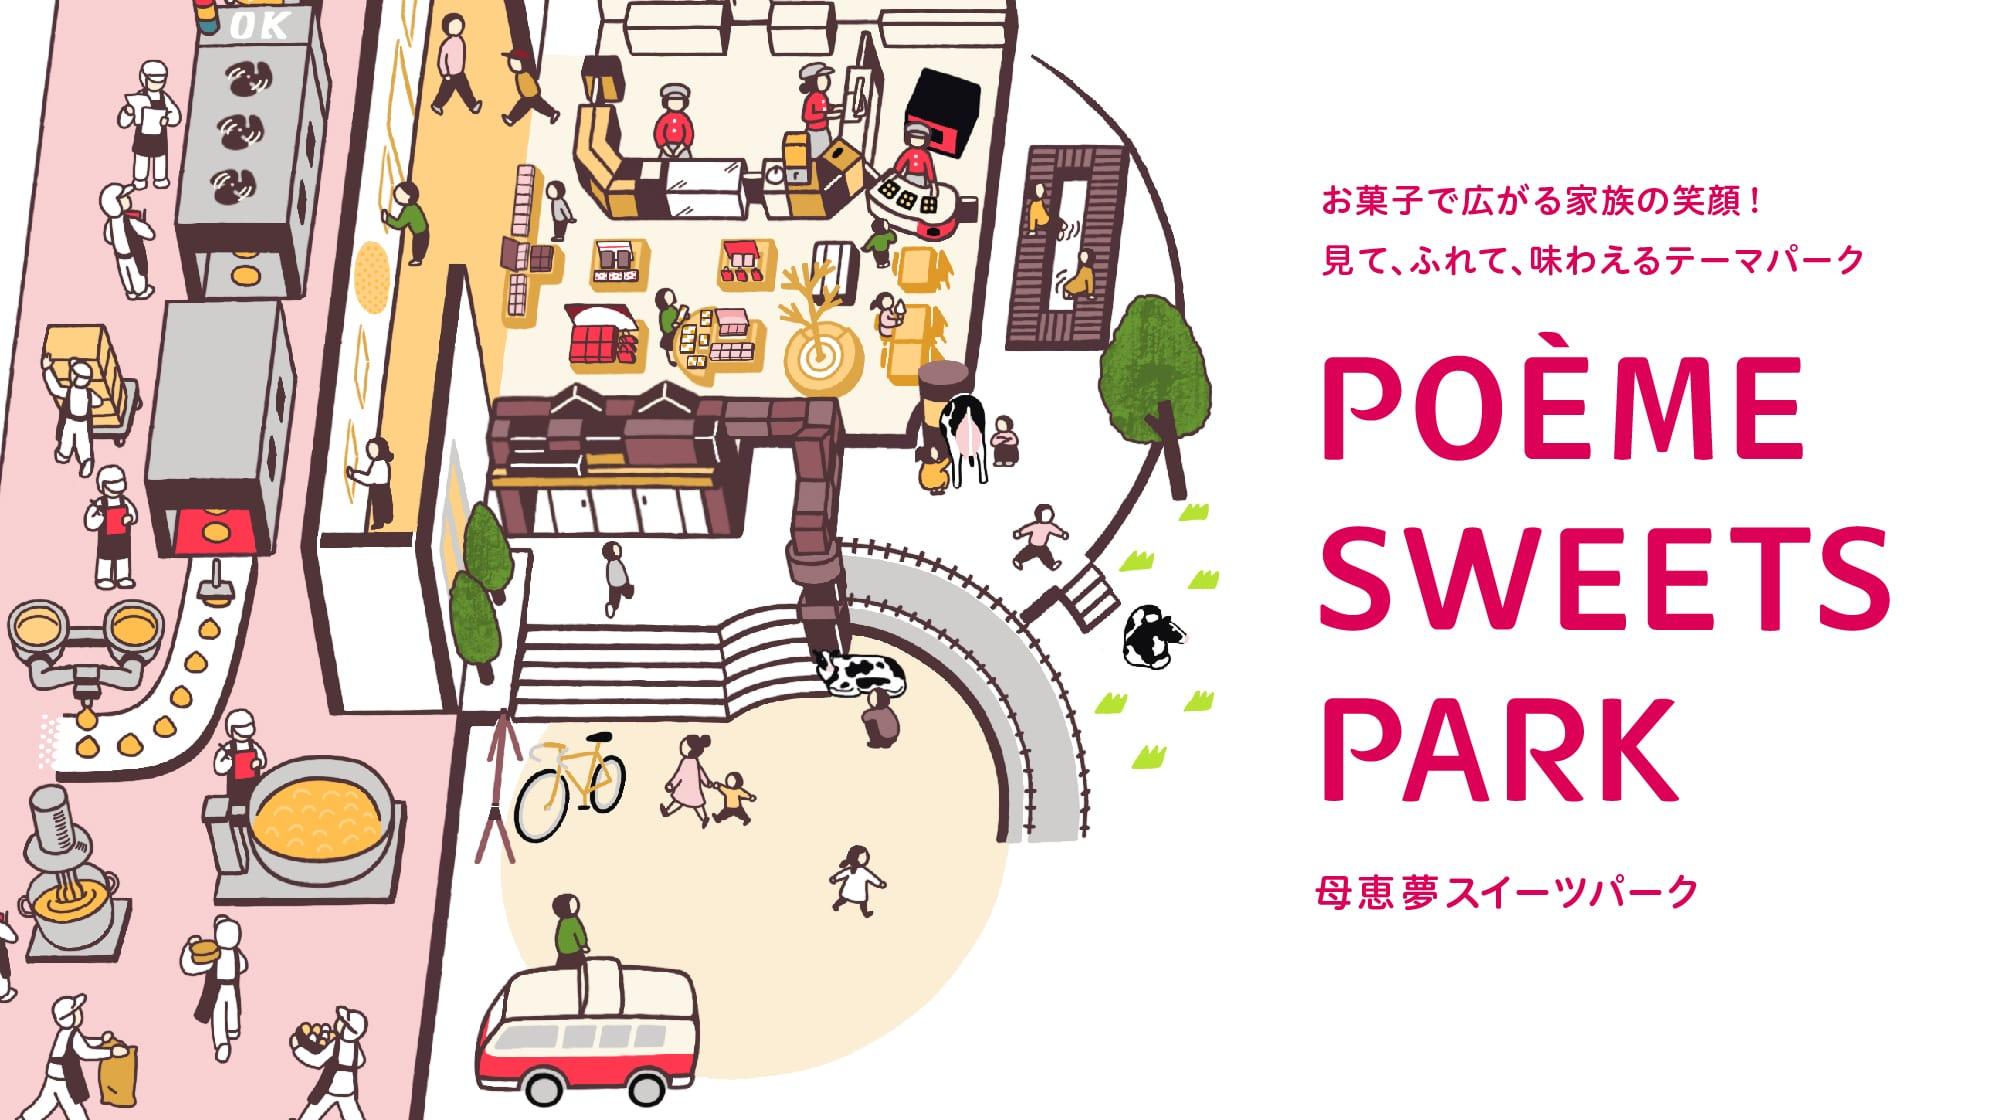 POEME SWEETS PARK|母恵夢スイーツパーク